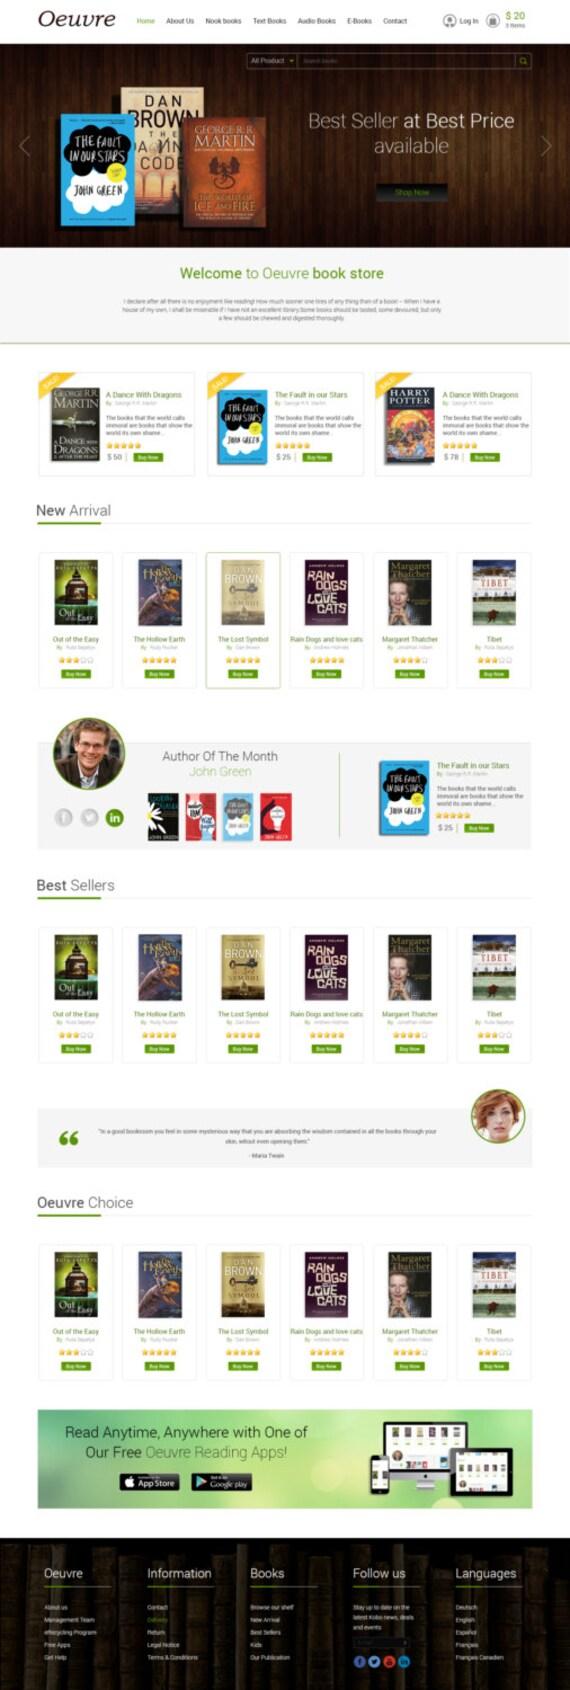 Bookstore eCommerce Website eCommerce Template Online